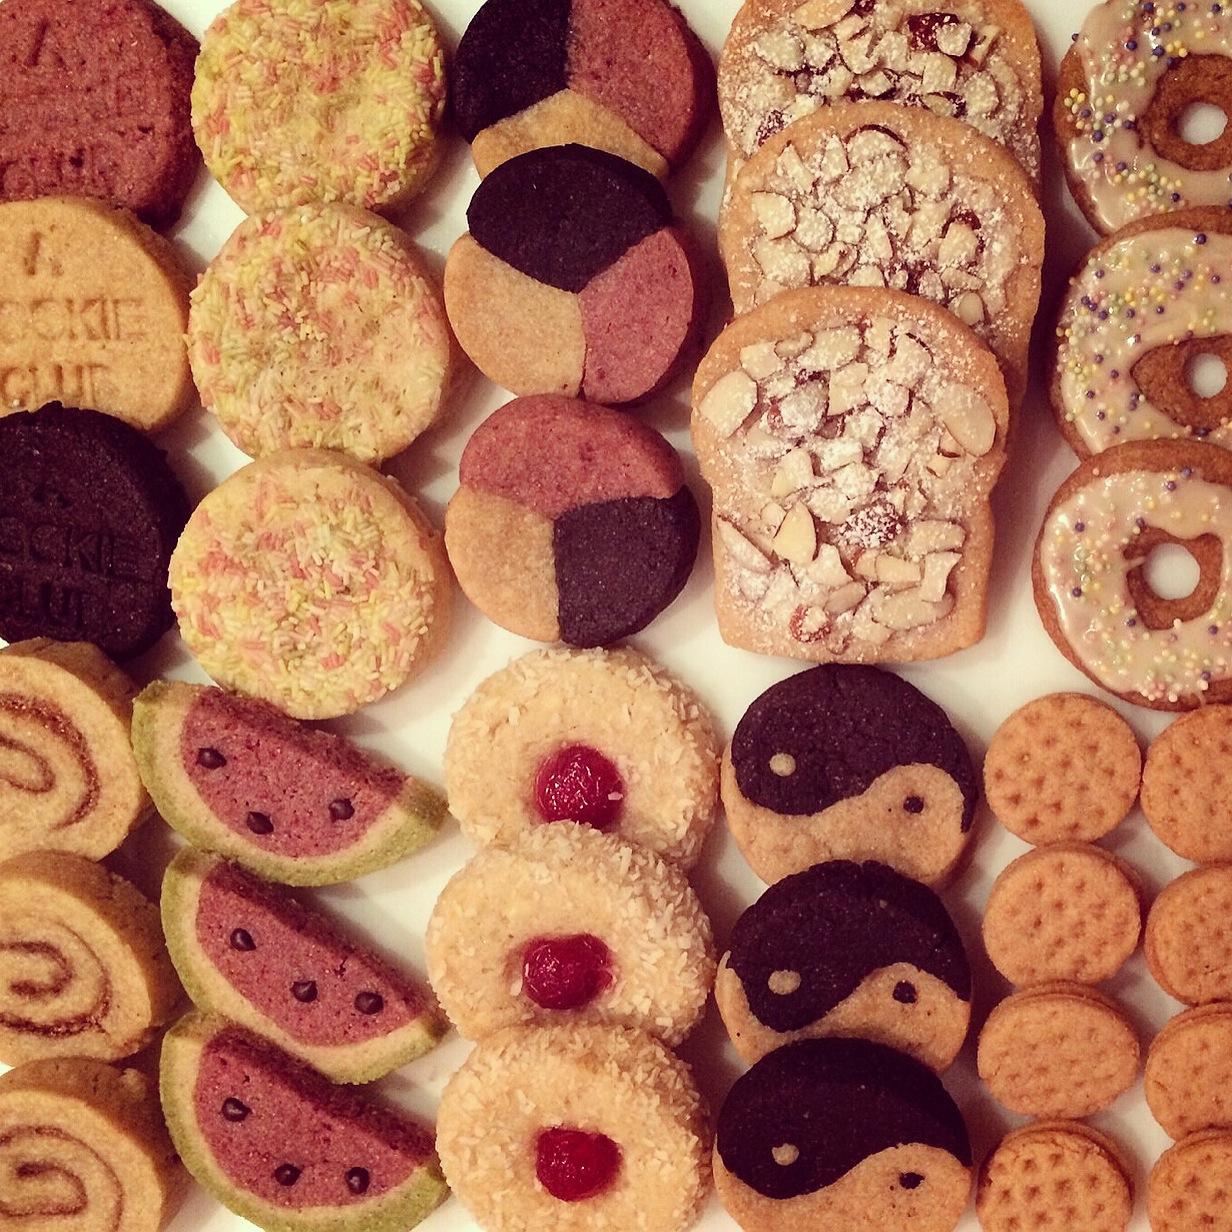 LA Weekly pancake breakfast assortment VEGAN / GLUTENFREE summer 2014